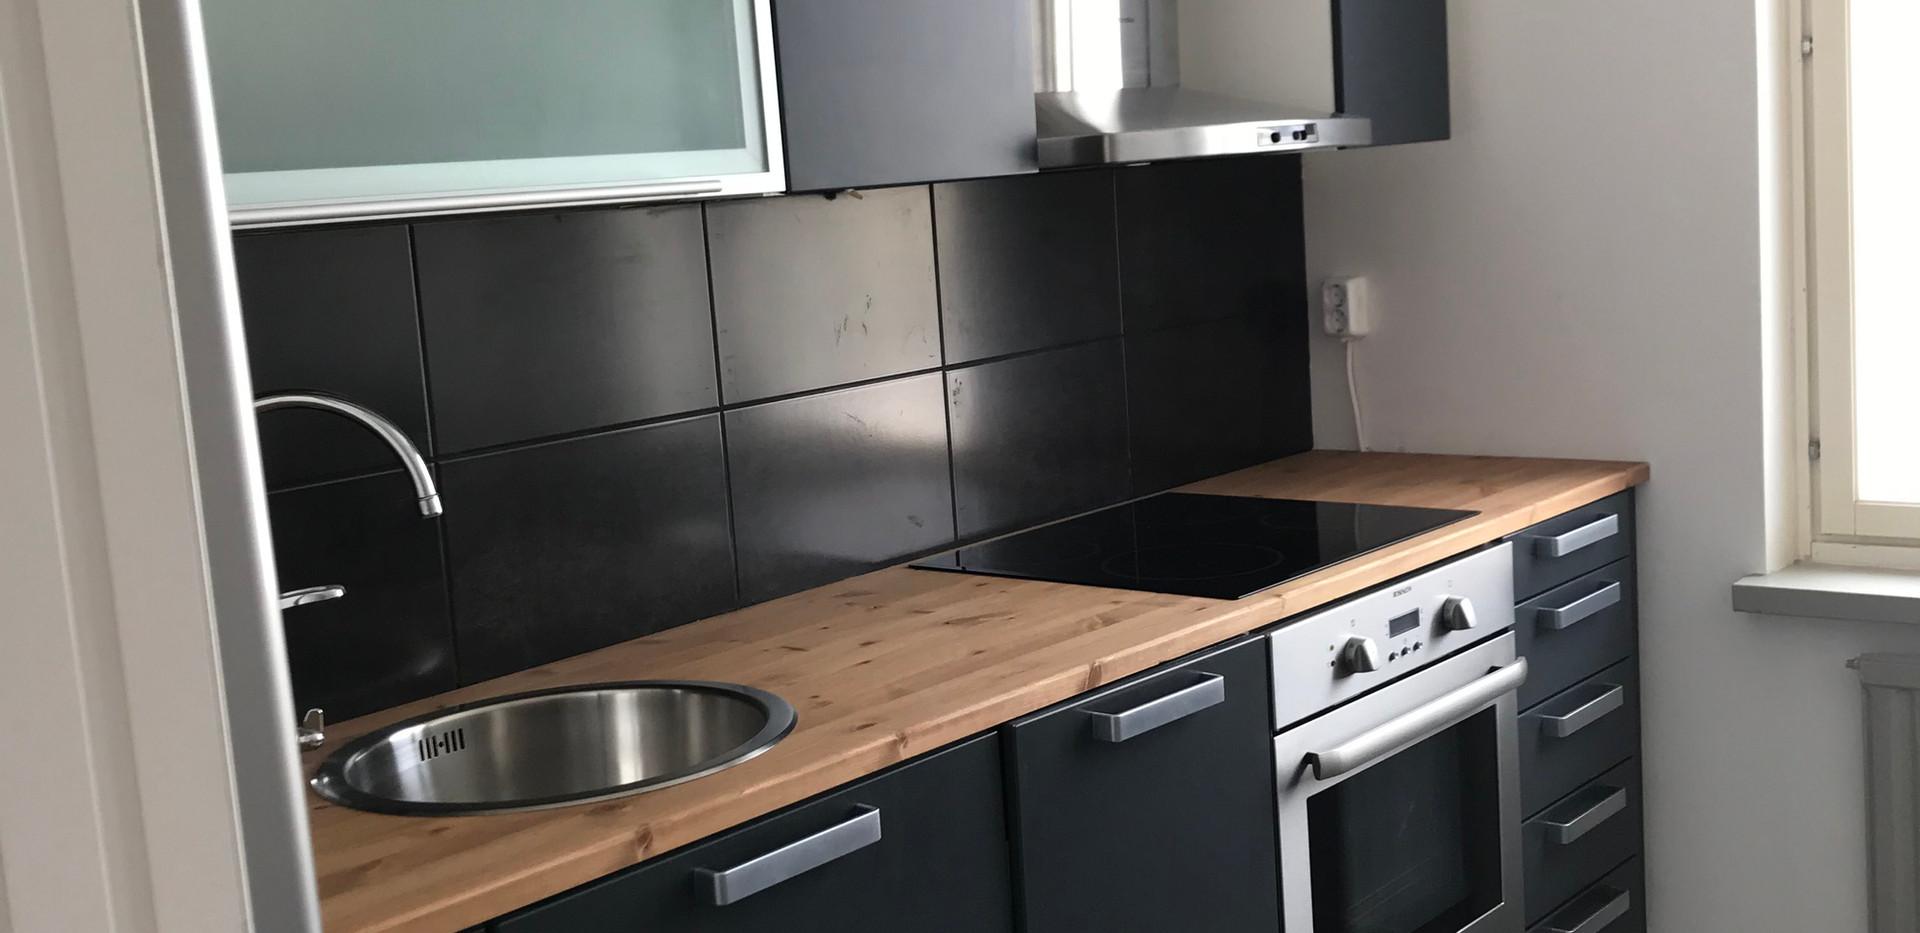 Carefix keittiö ja pintaremontti